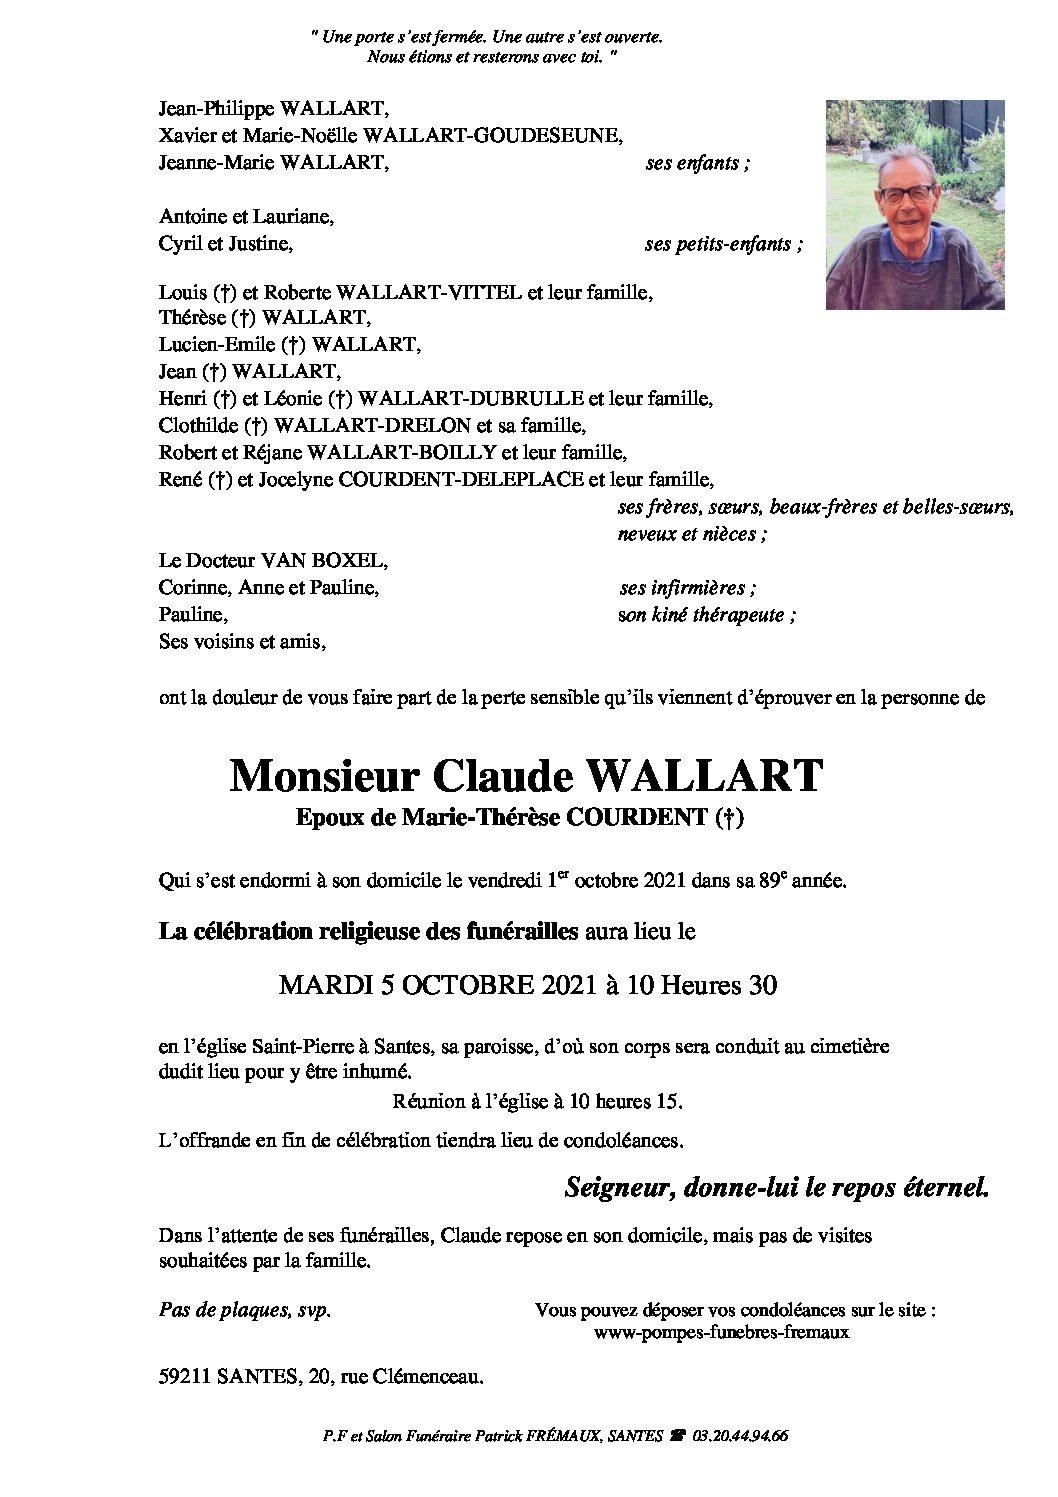 Monsieur Claude WALLART